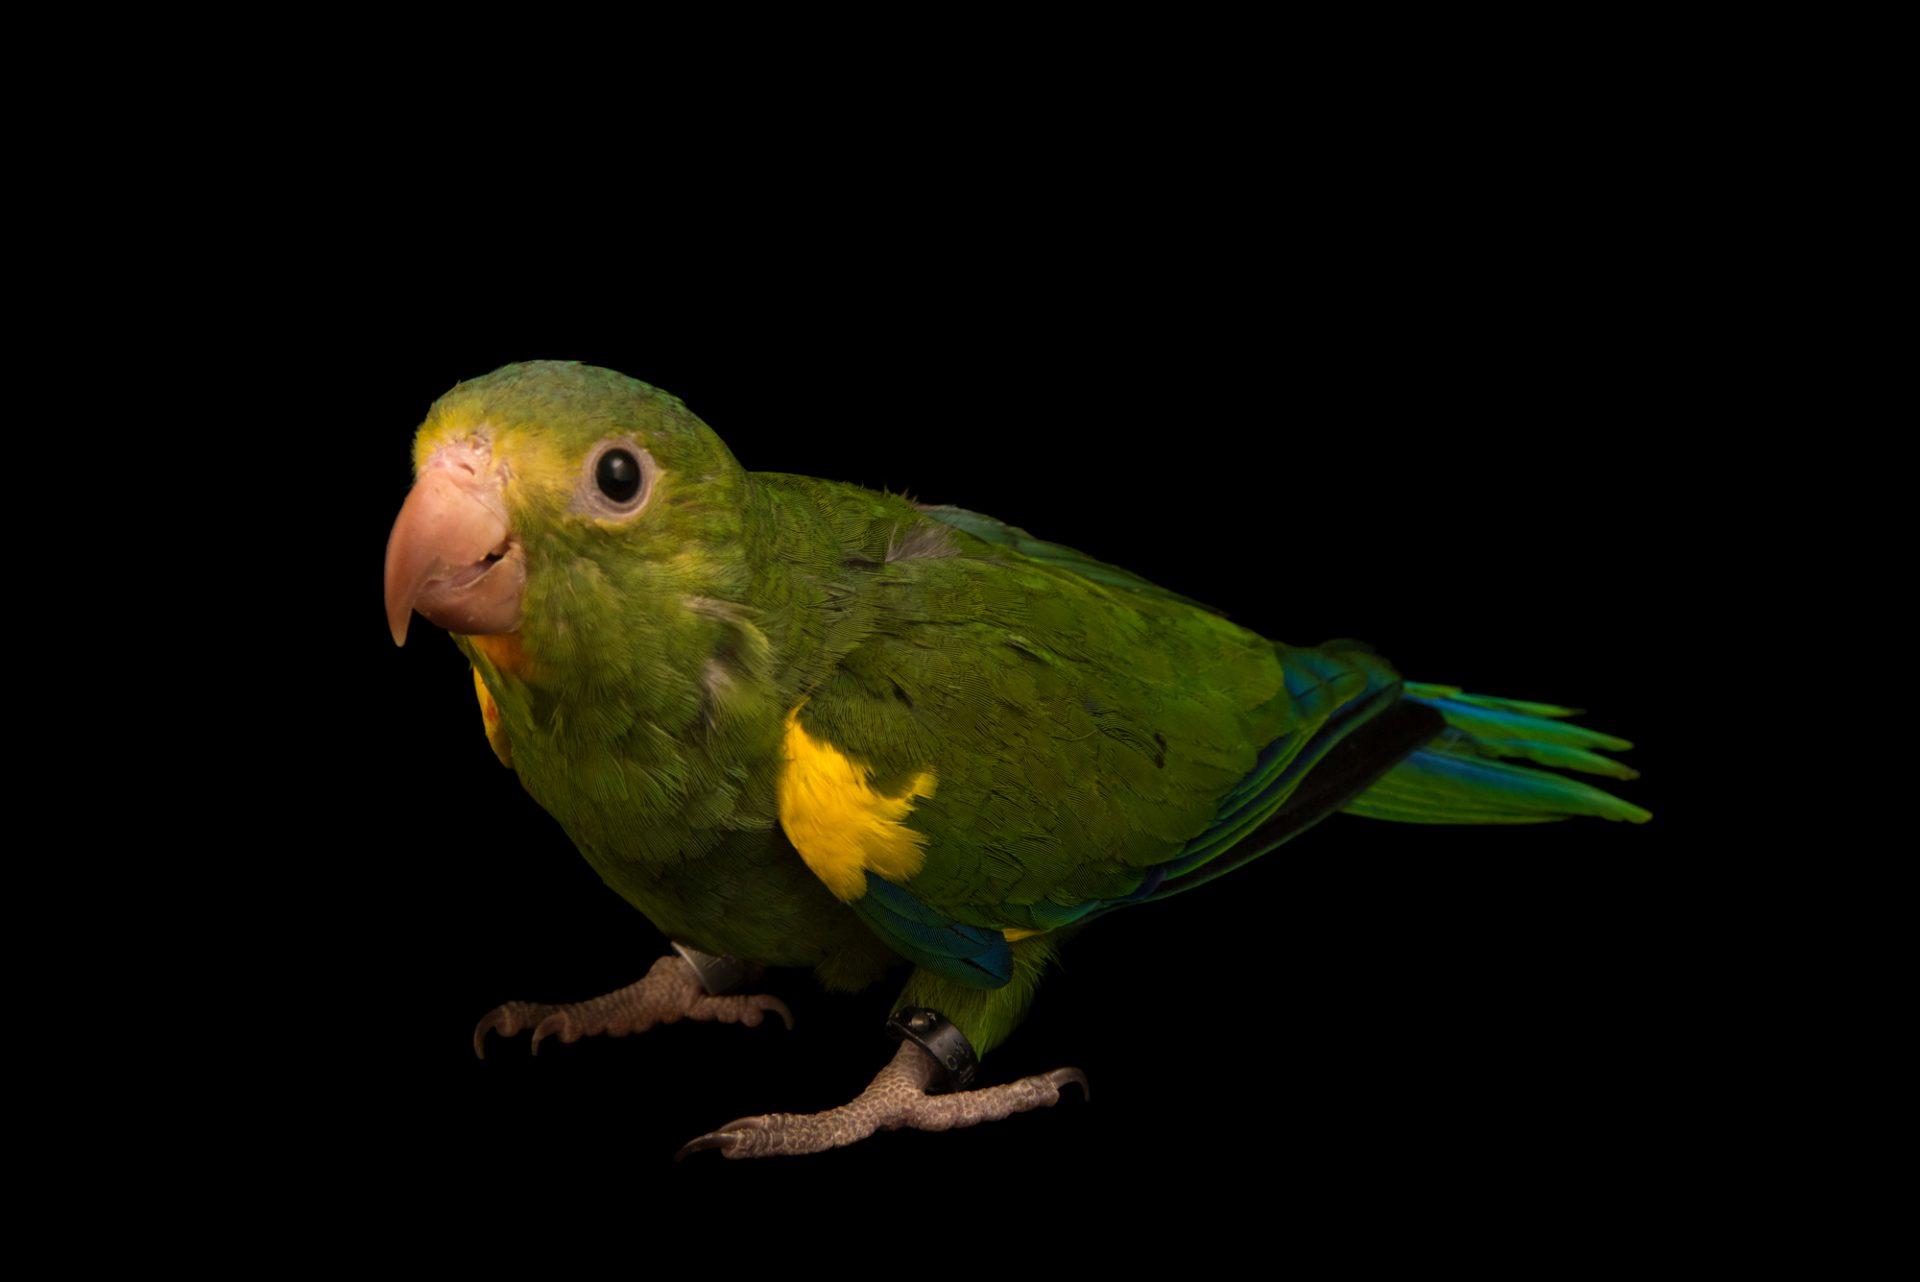 Photo: Cobalt winged parakeet (Brotogeris cyanoptera gustavi) at Loro Parque Fundacion.